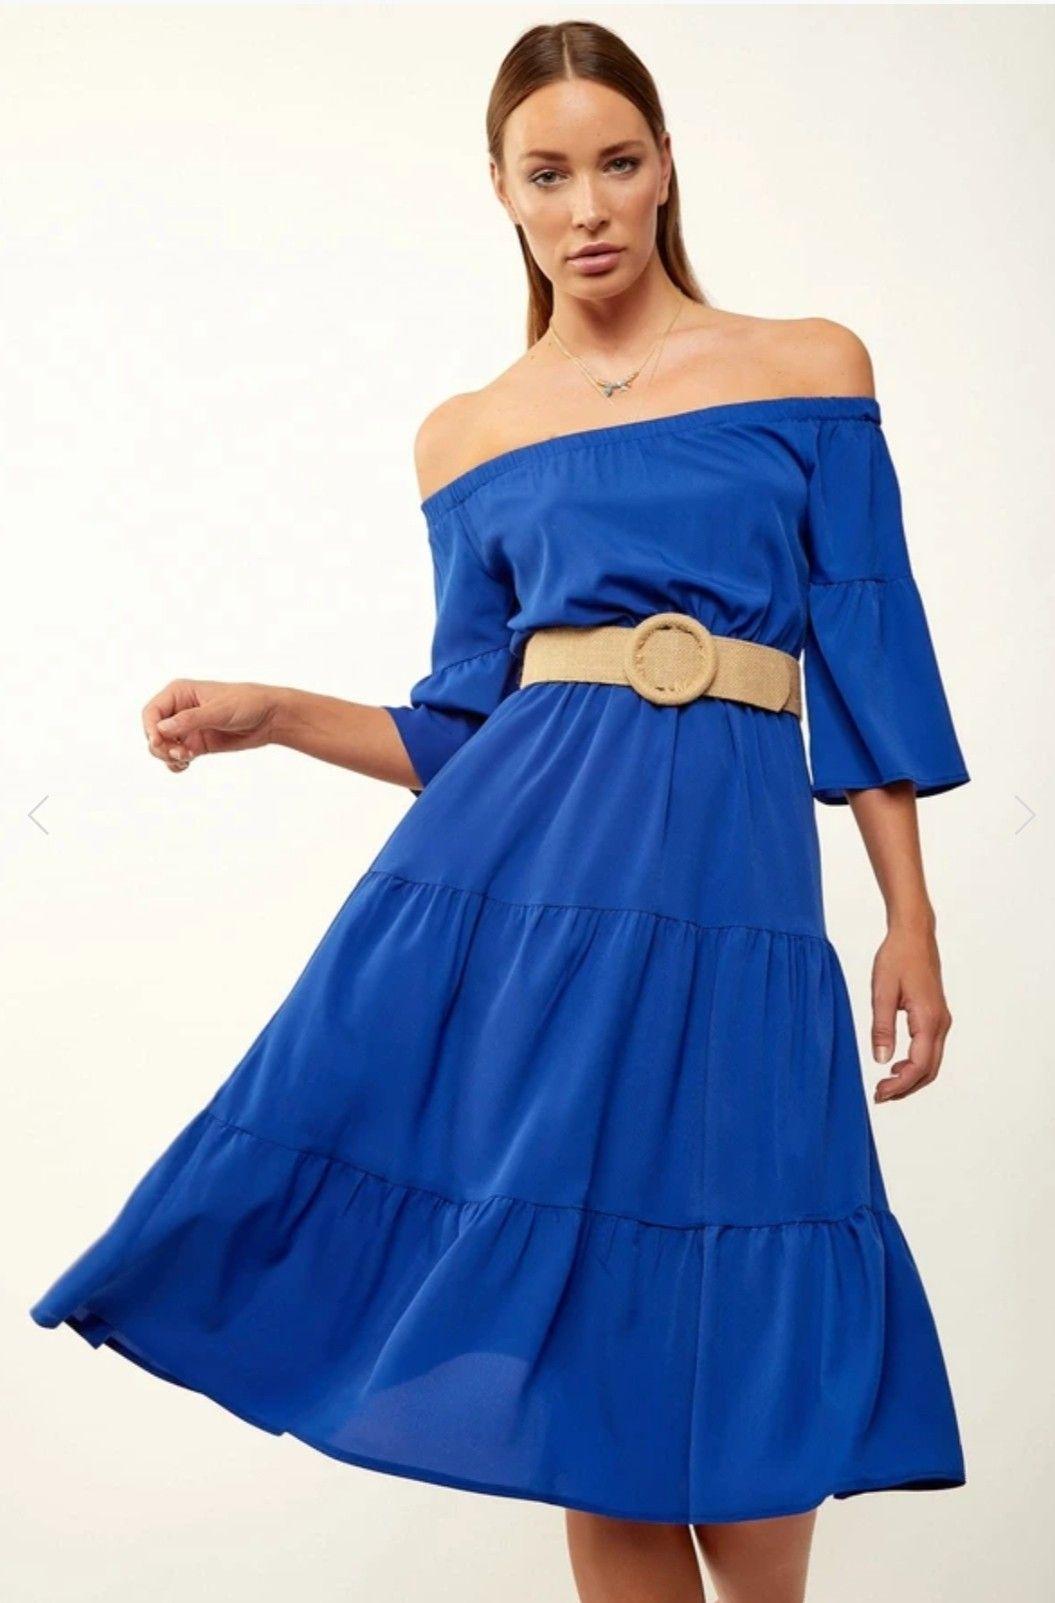 فستان ميدي أزرق برقبة بدون أكتاف نسائي Fashion Off Shoulder Dress Dresses